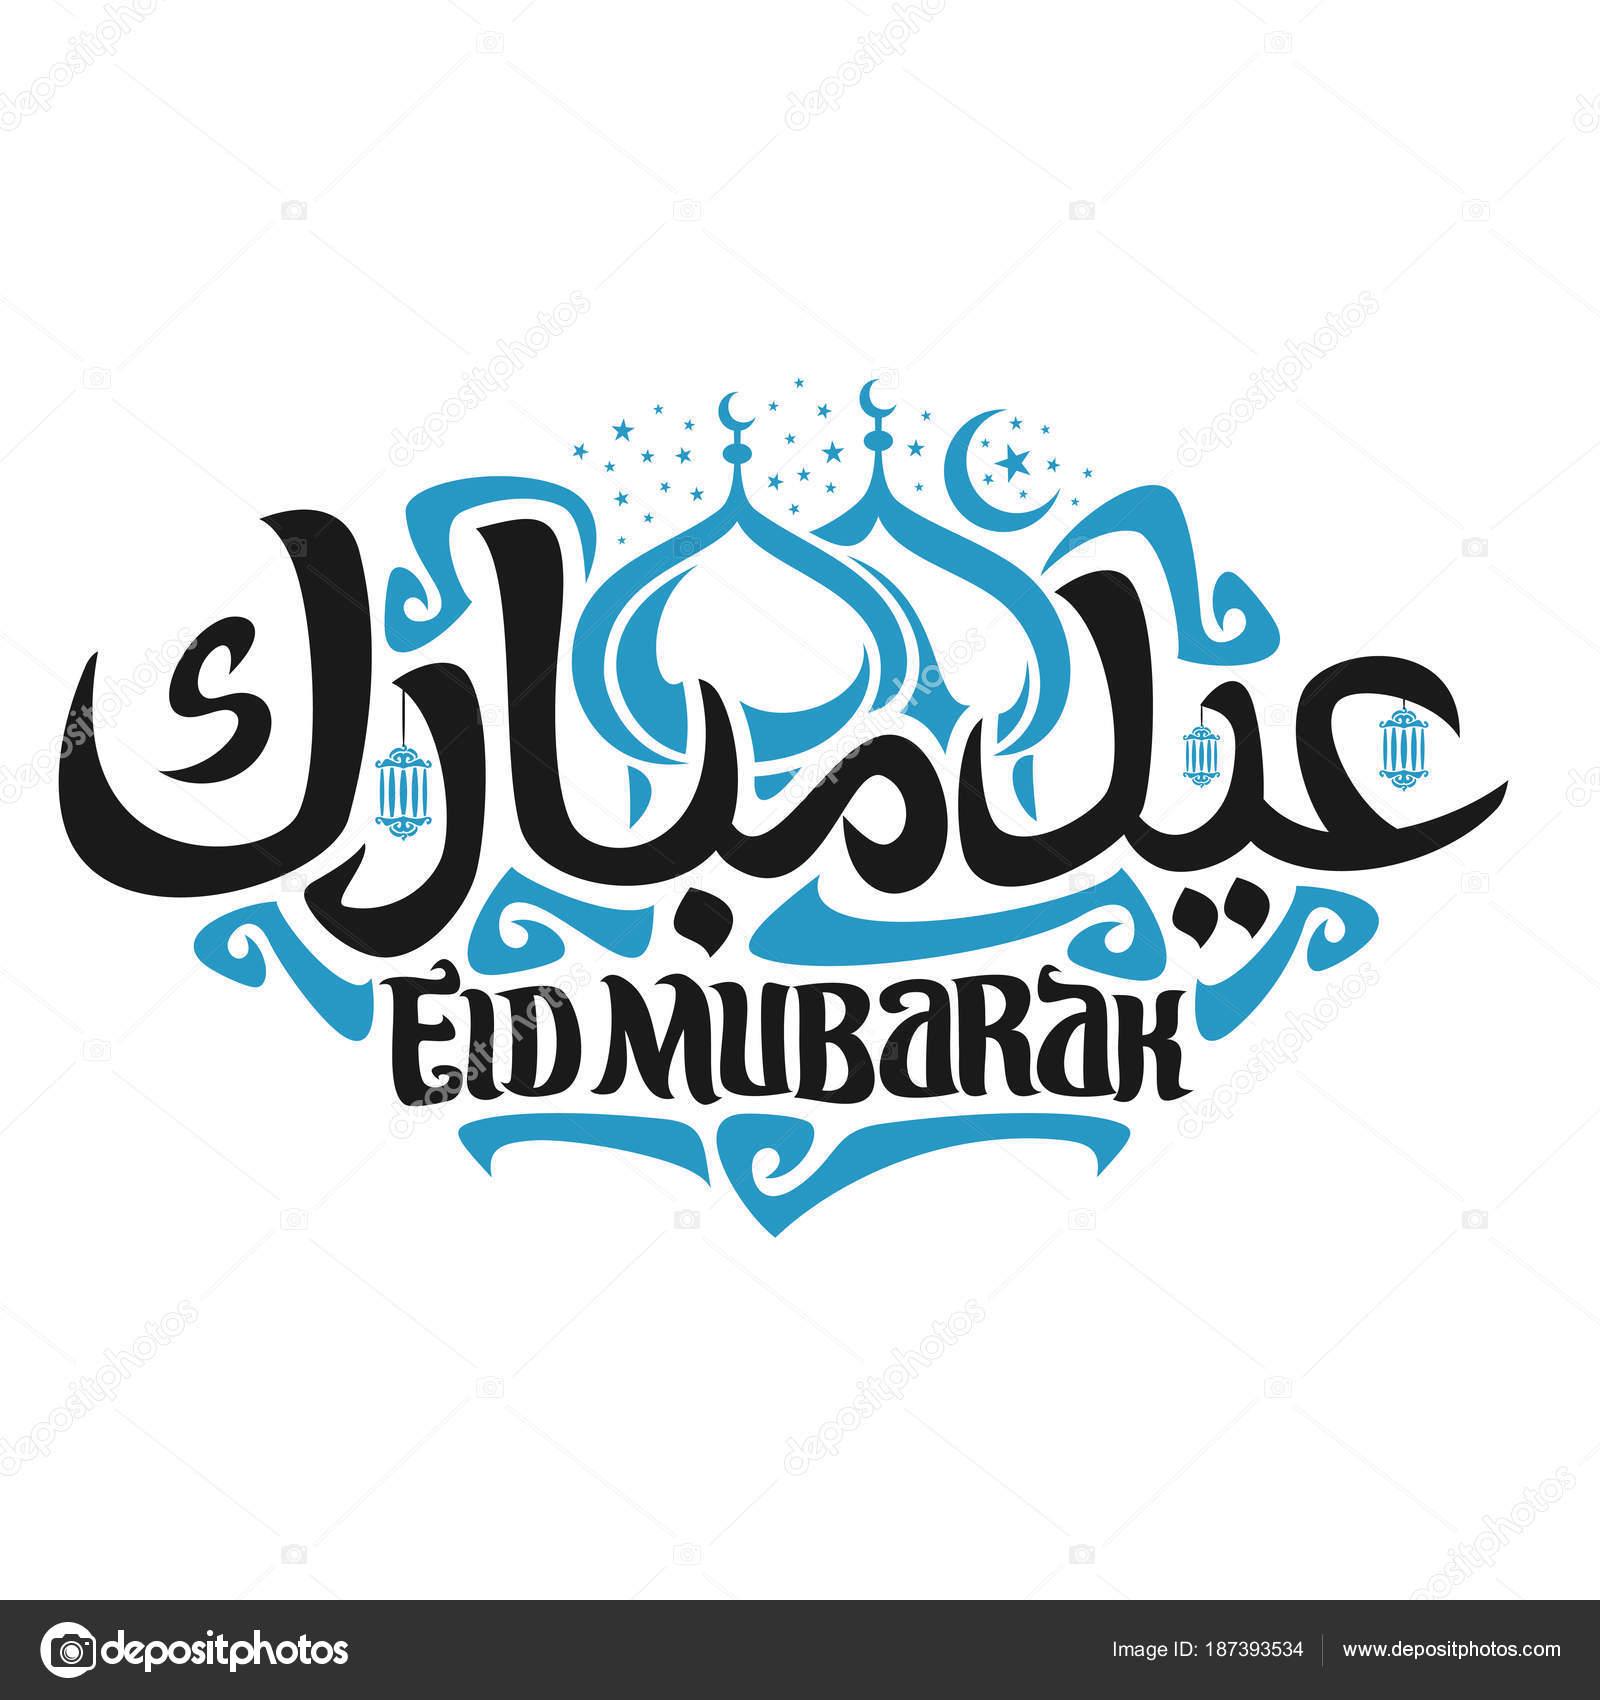 Vector logo muslim holiday eid mubarak calligraphy sign original vector logo for muslim holiday eid mubarak calligraphy sign with original brush typeface for black words eid mubarak in arabic with hanging lamps kristyandbryce Image collections